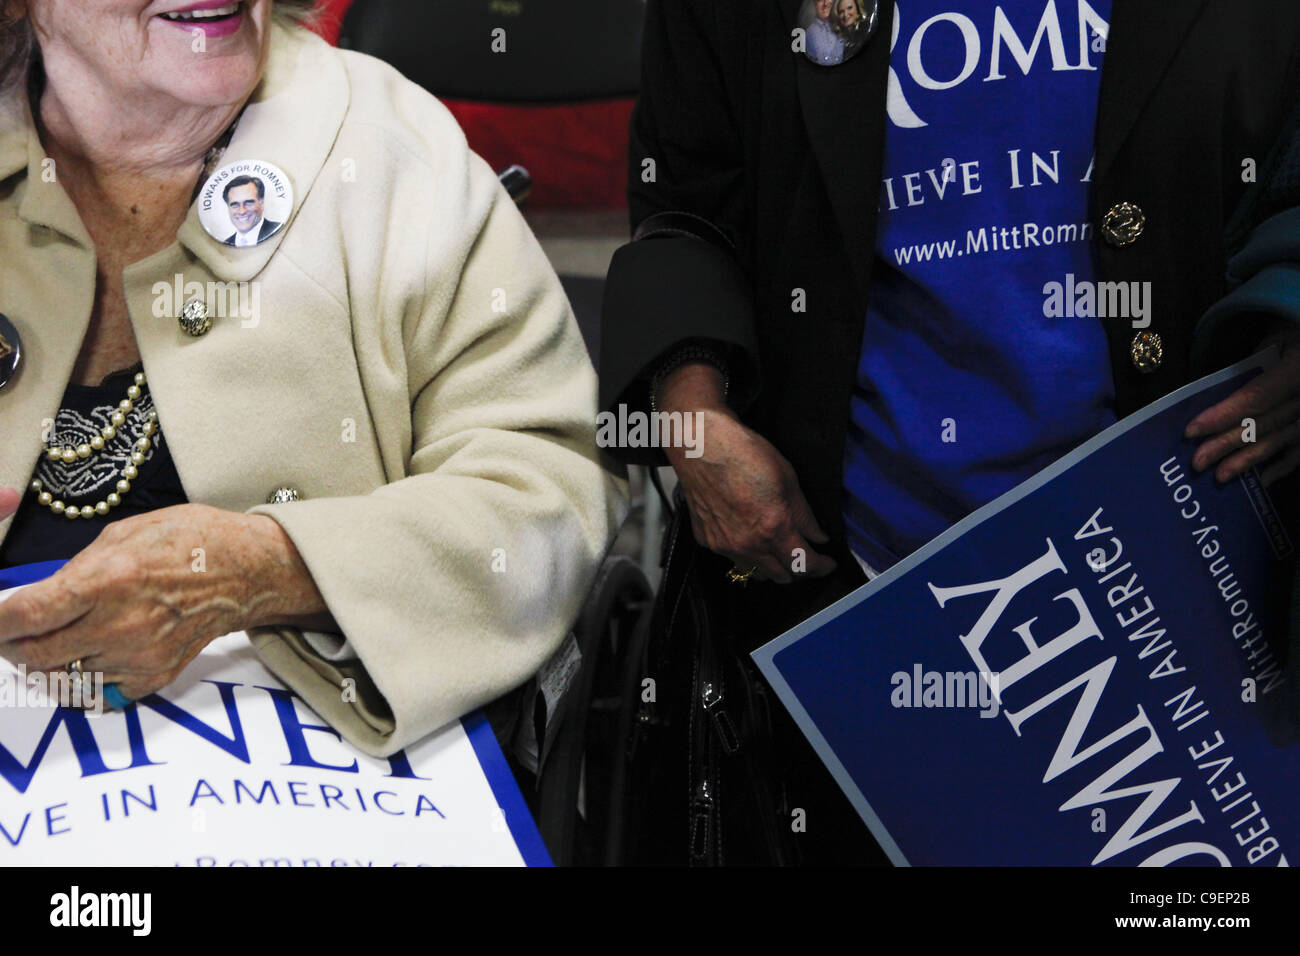 Dec. 9, 2011 - Cedar Rapids, Iowa, U.S. - Elderly supporters of Republican presidential candidate Mitt Romney hold Stock Photo